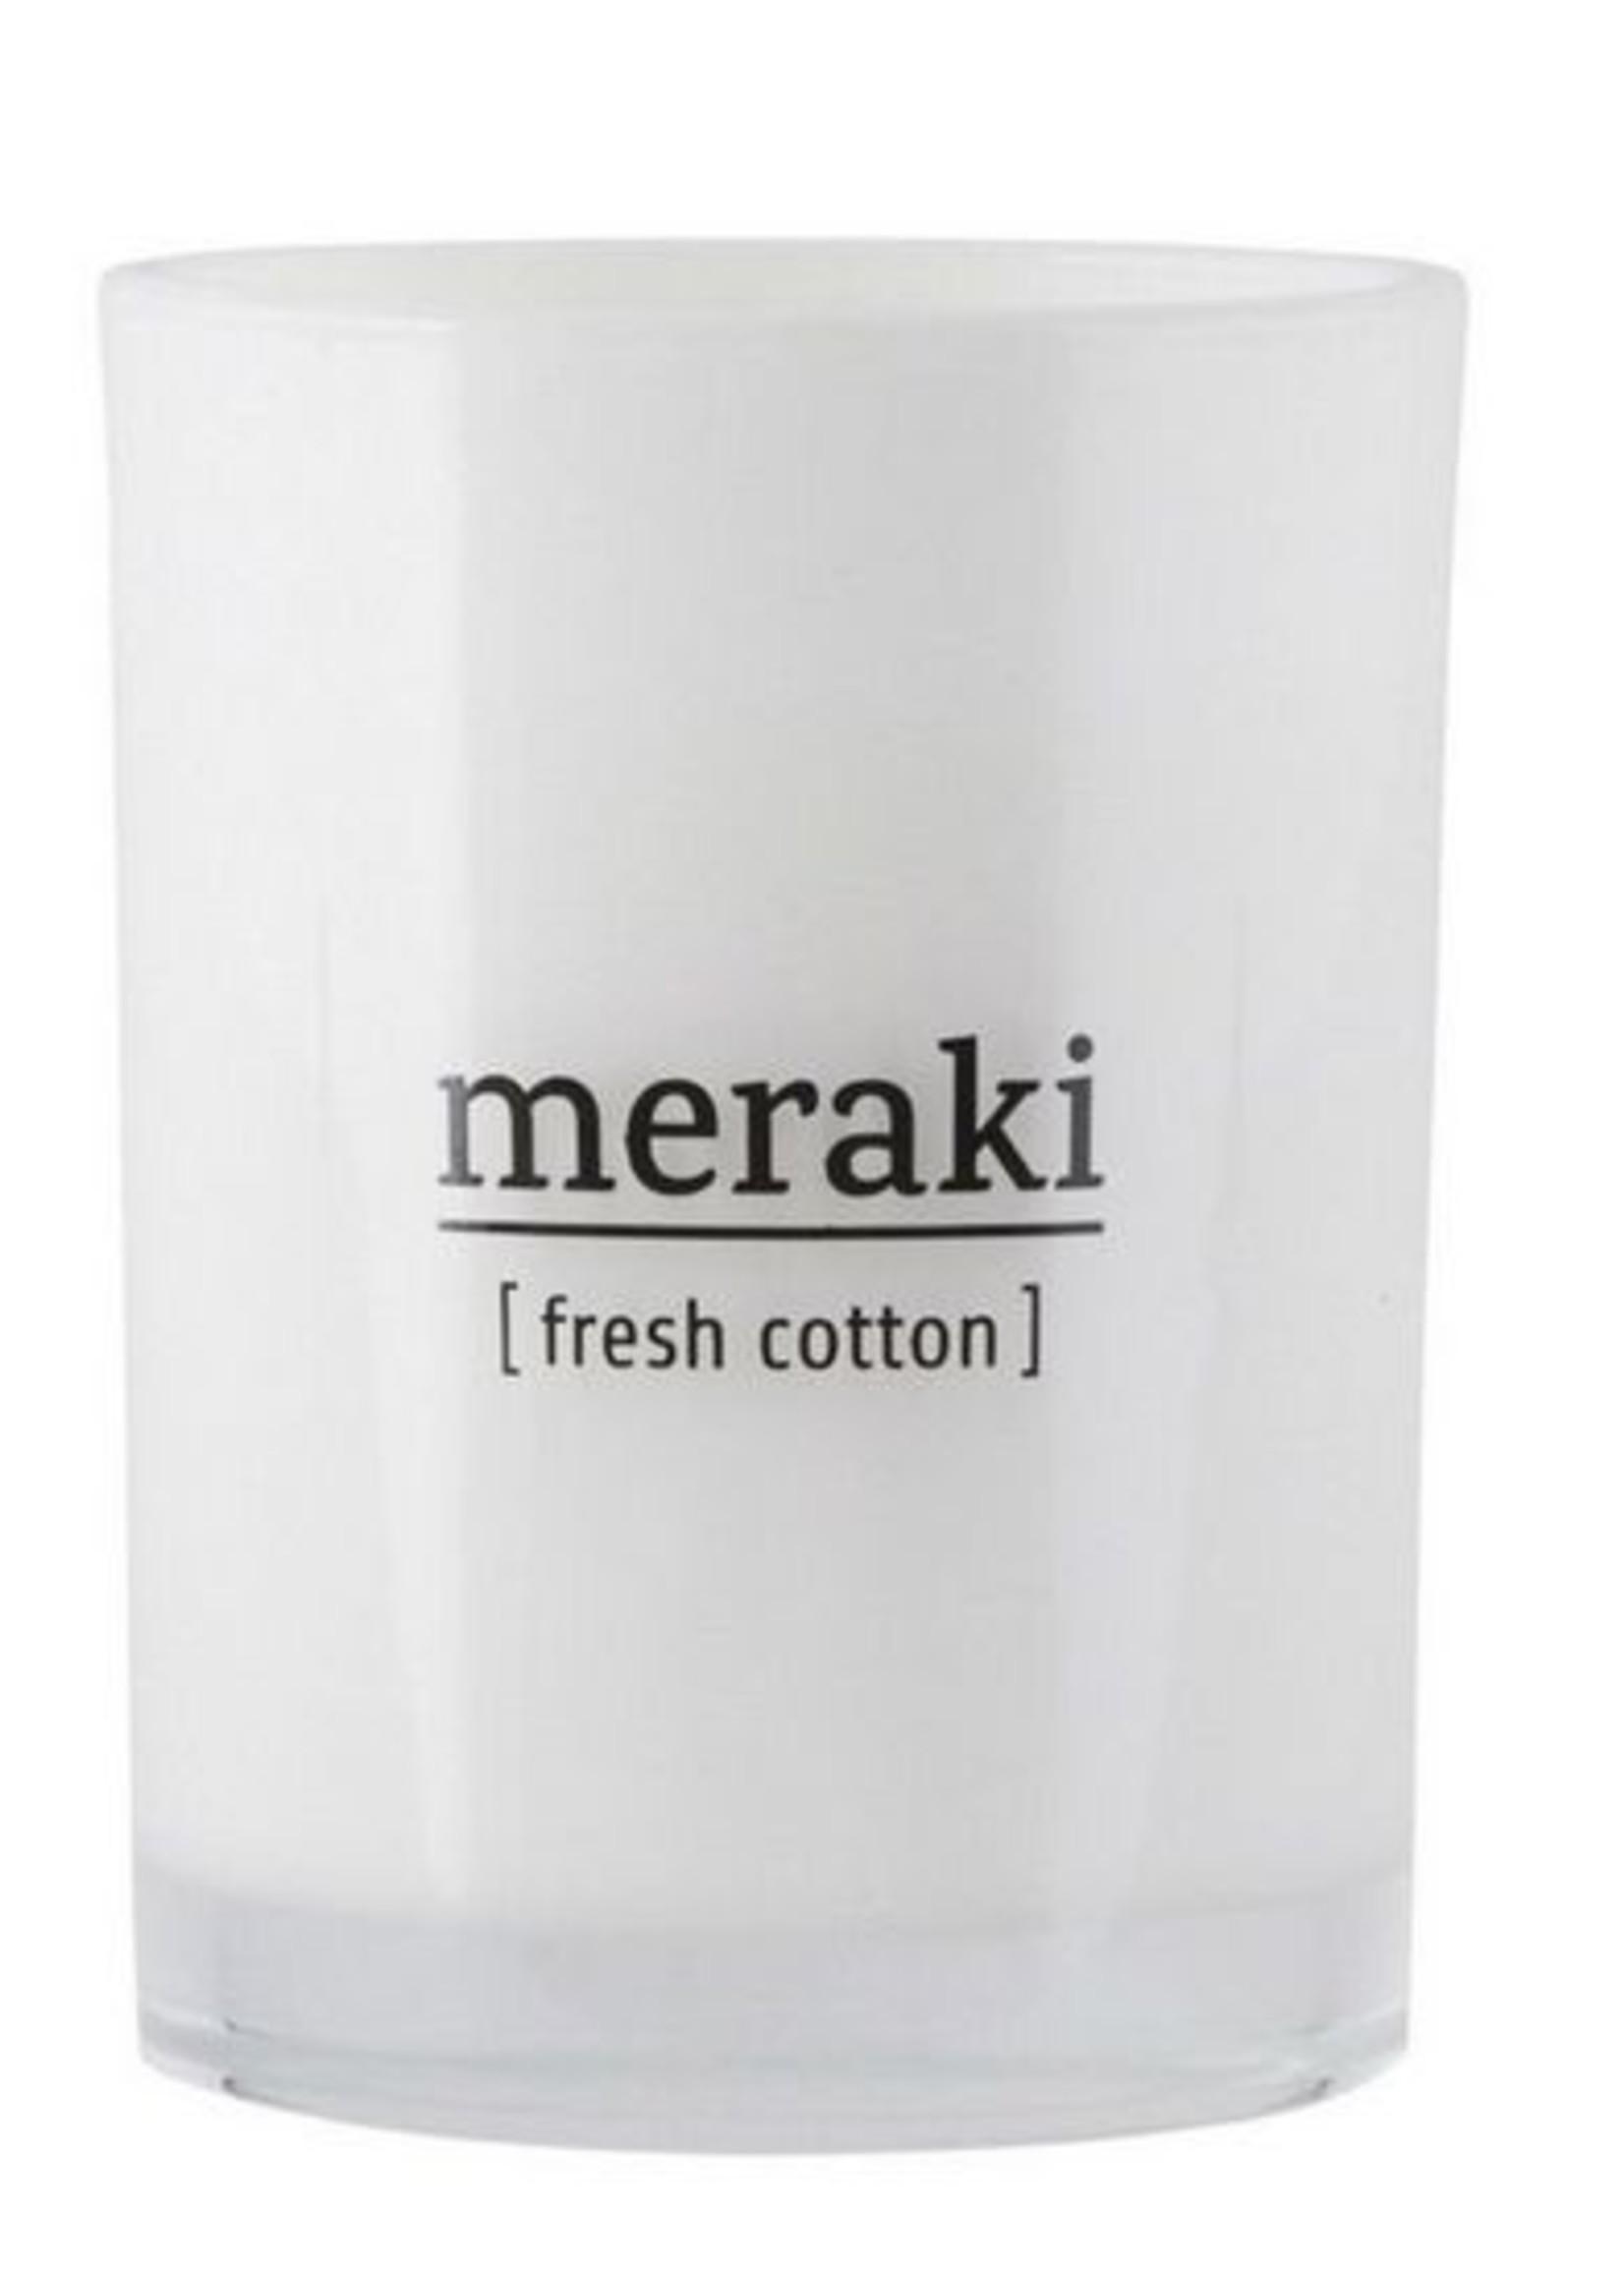 Meraki Scented candle, Fresh cotton